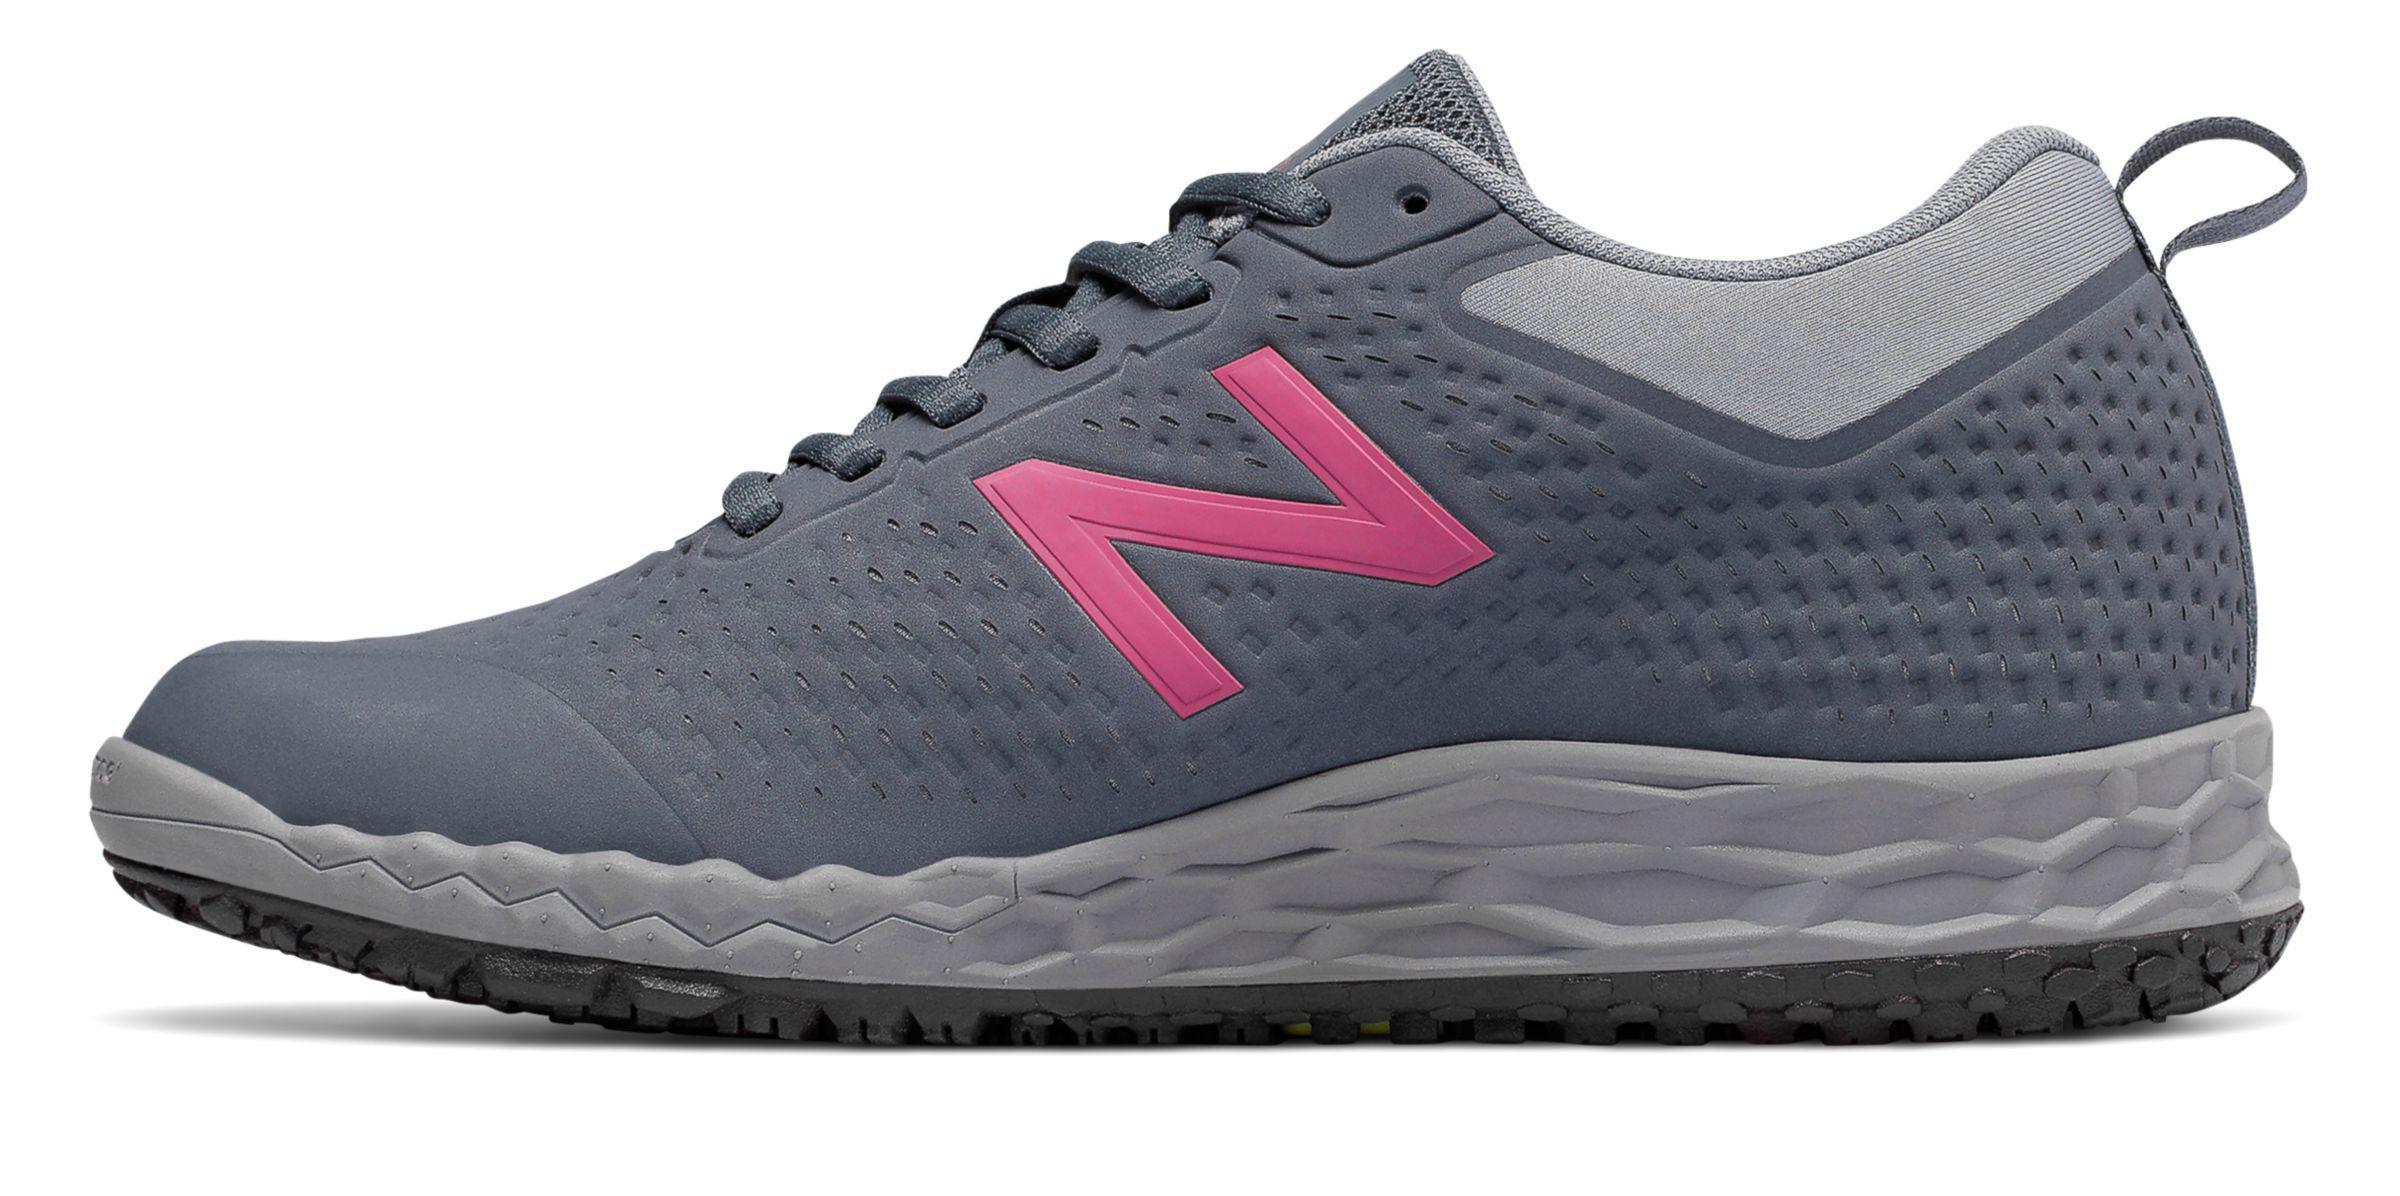 37287e2628026 New Balance Gray Slip Resistant Fresh Foam 806. View fullscreen